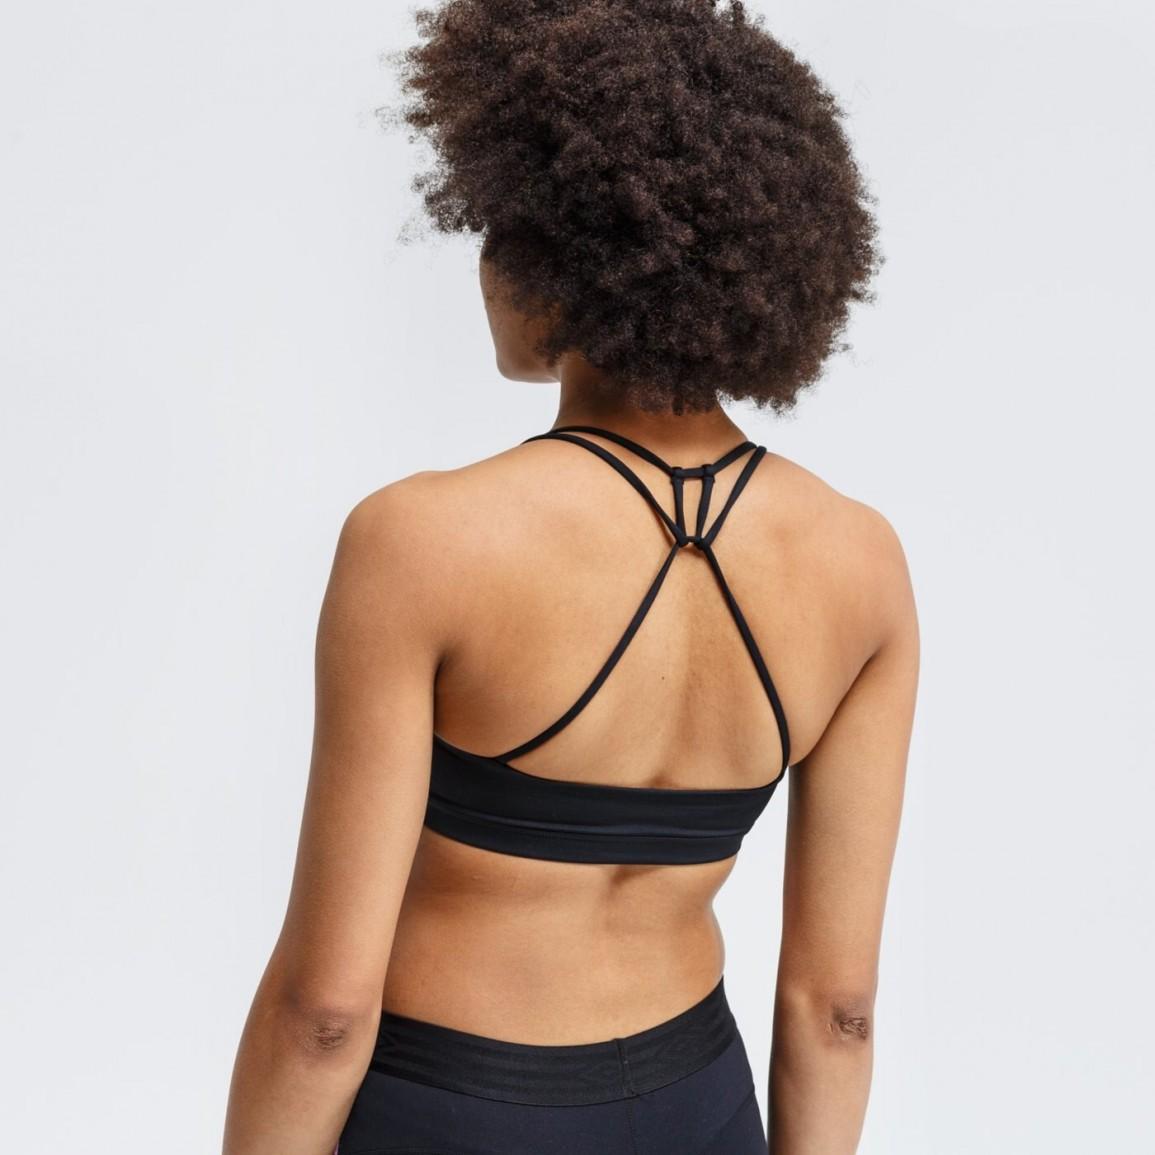 Топ женский Nike INDY NON PAD Bra black/white